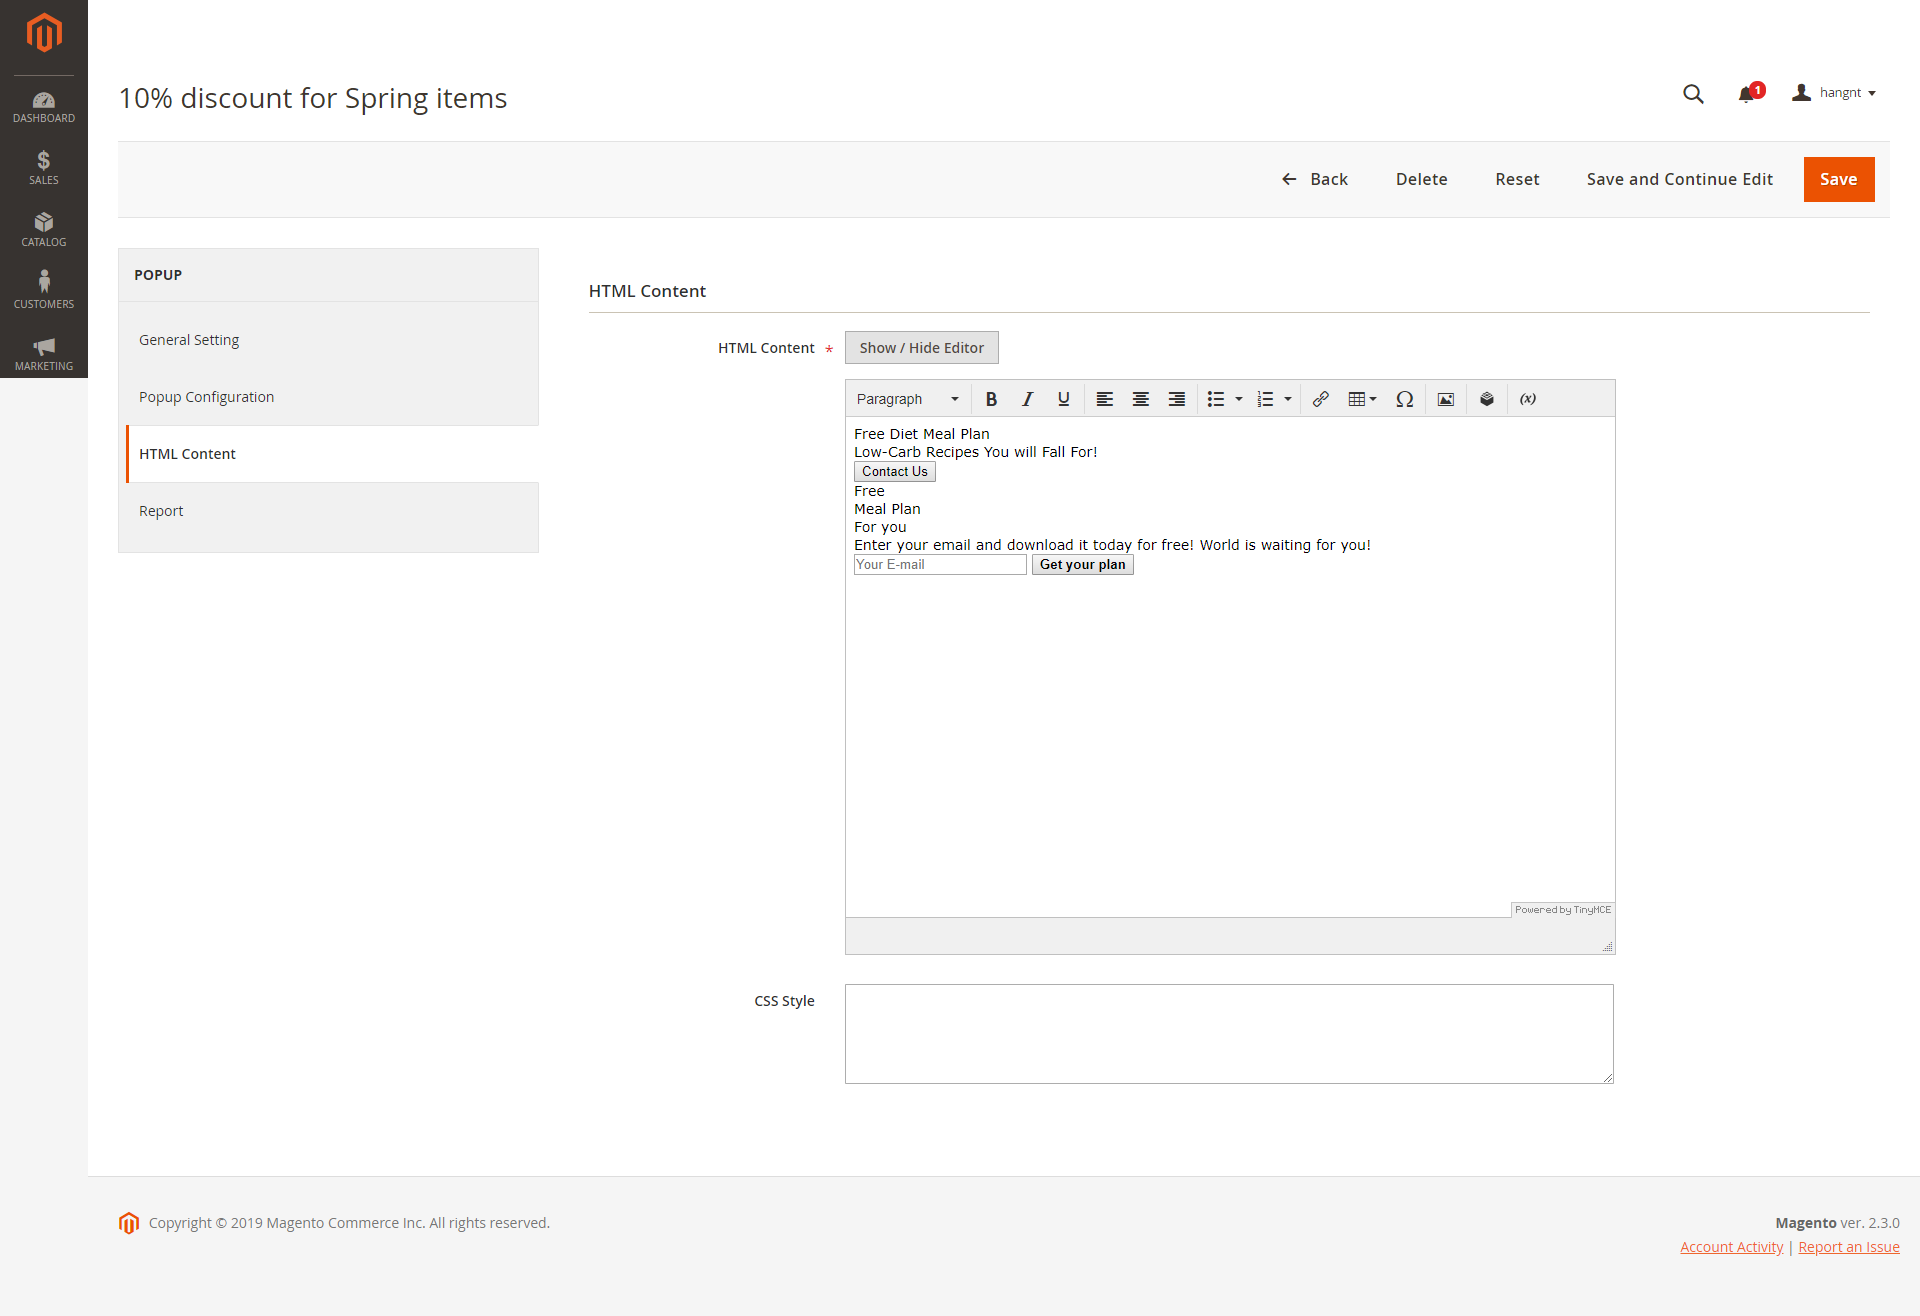 Popup Integration for Magento 2 User Guide - Documentation